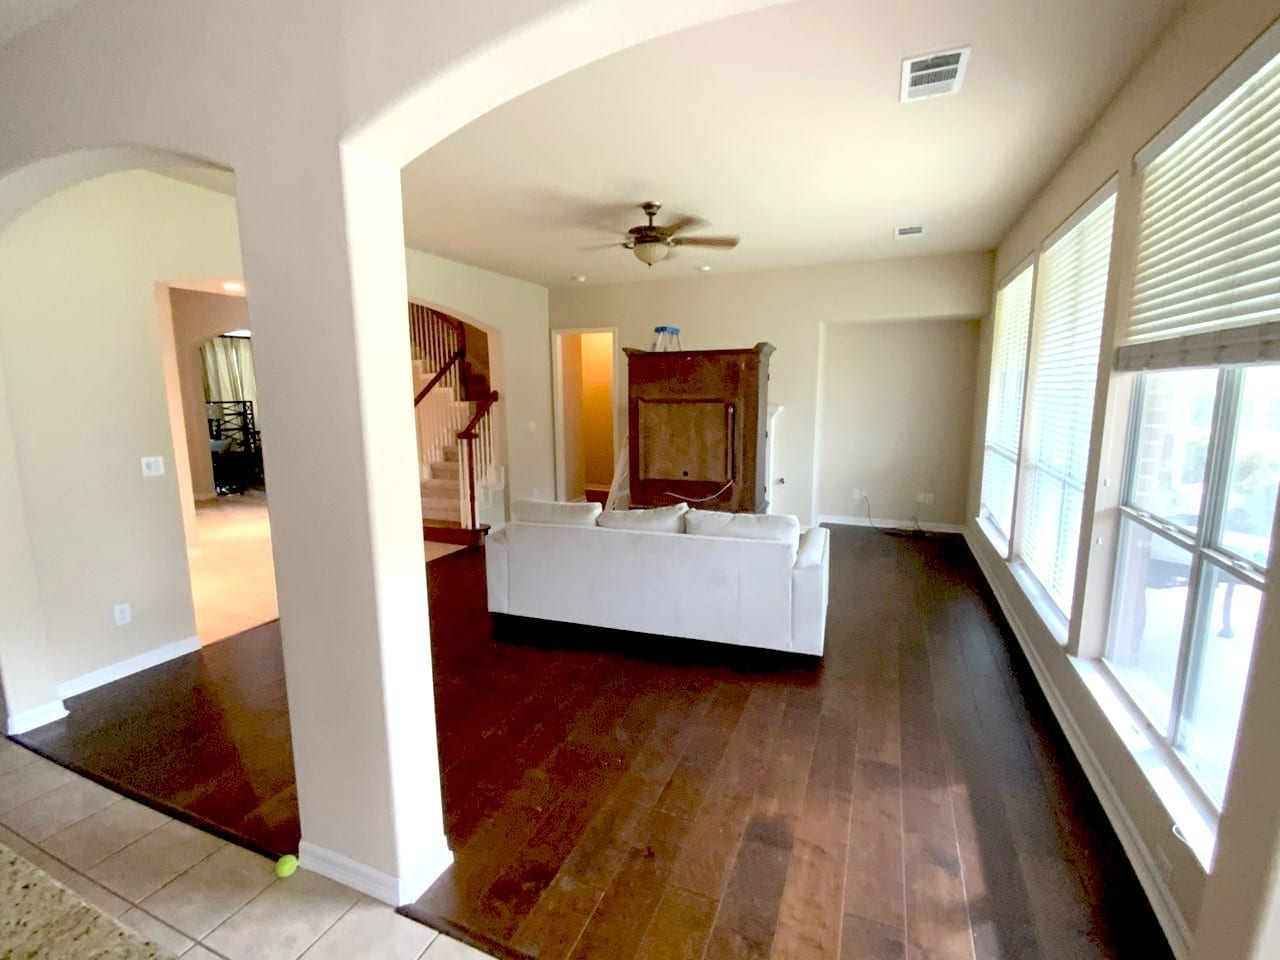 painted beige living room with wood floors